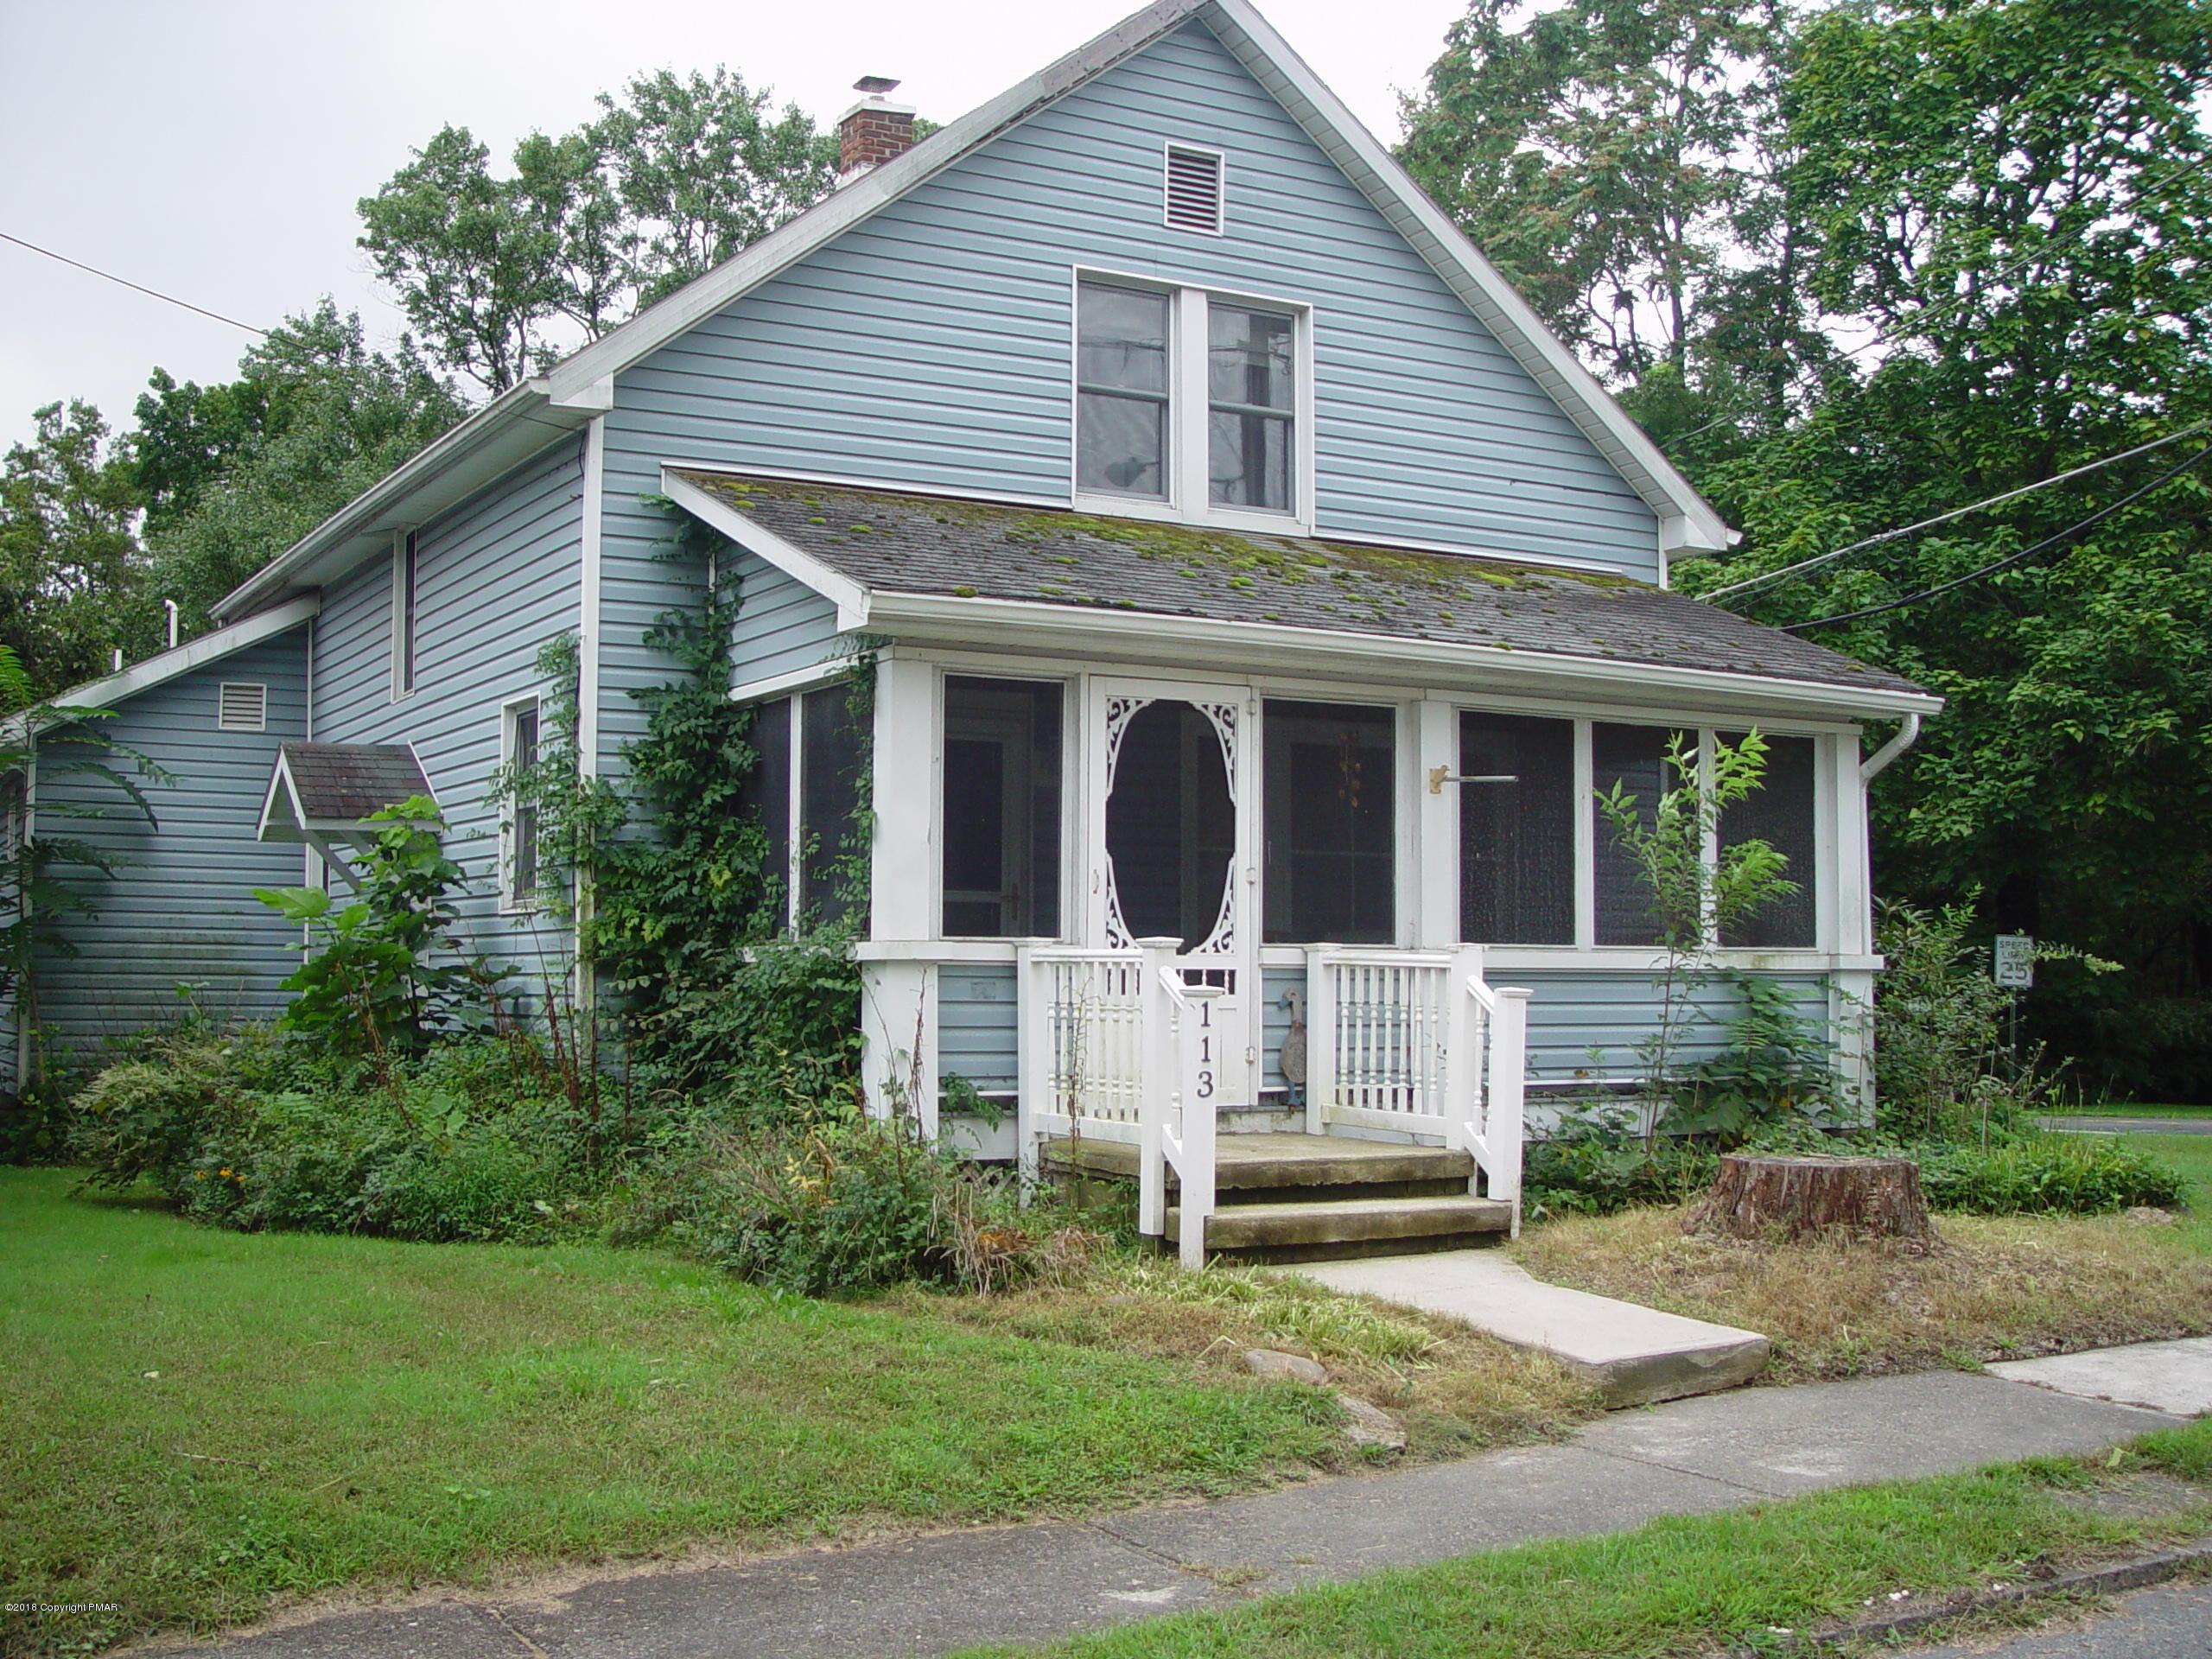 113 W 4th St, East Stroudsburg, PA 18301